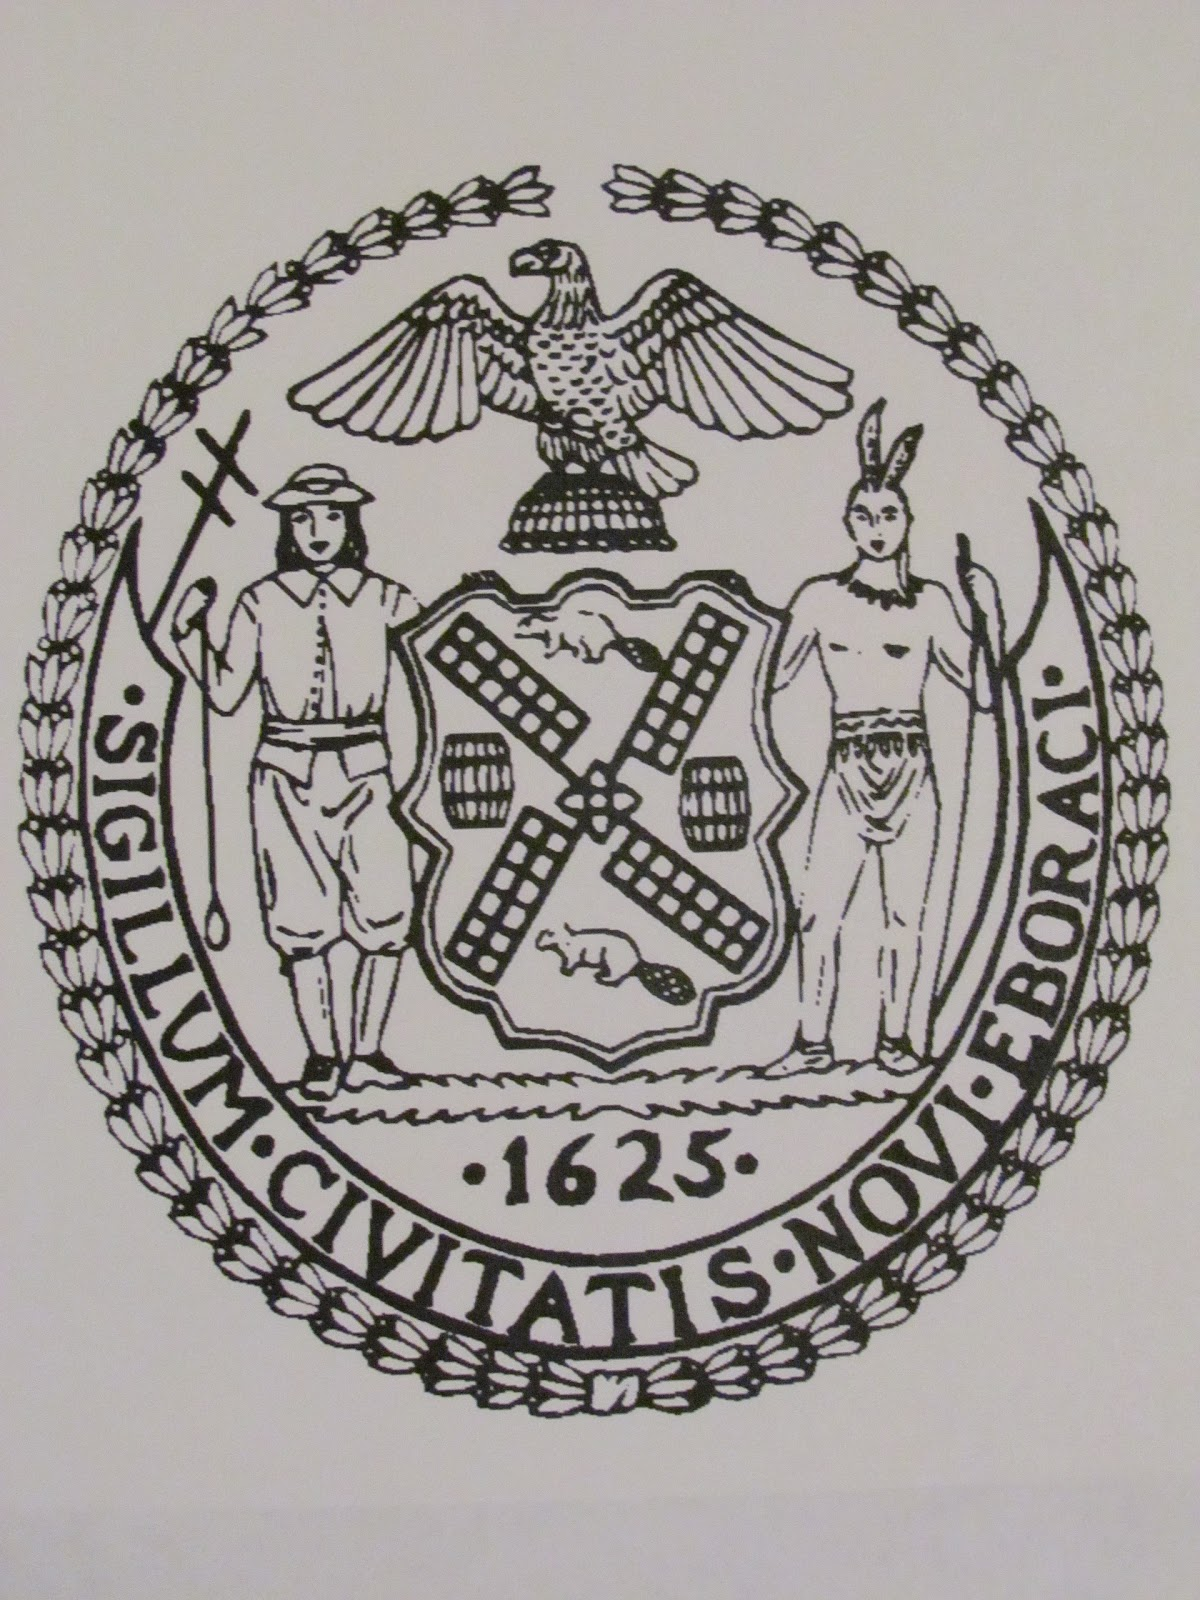 Manhattan unlocked decoding the seals of the city of new york manhattan unlocked biocorpaavc Choice Image